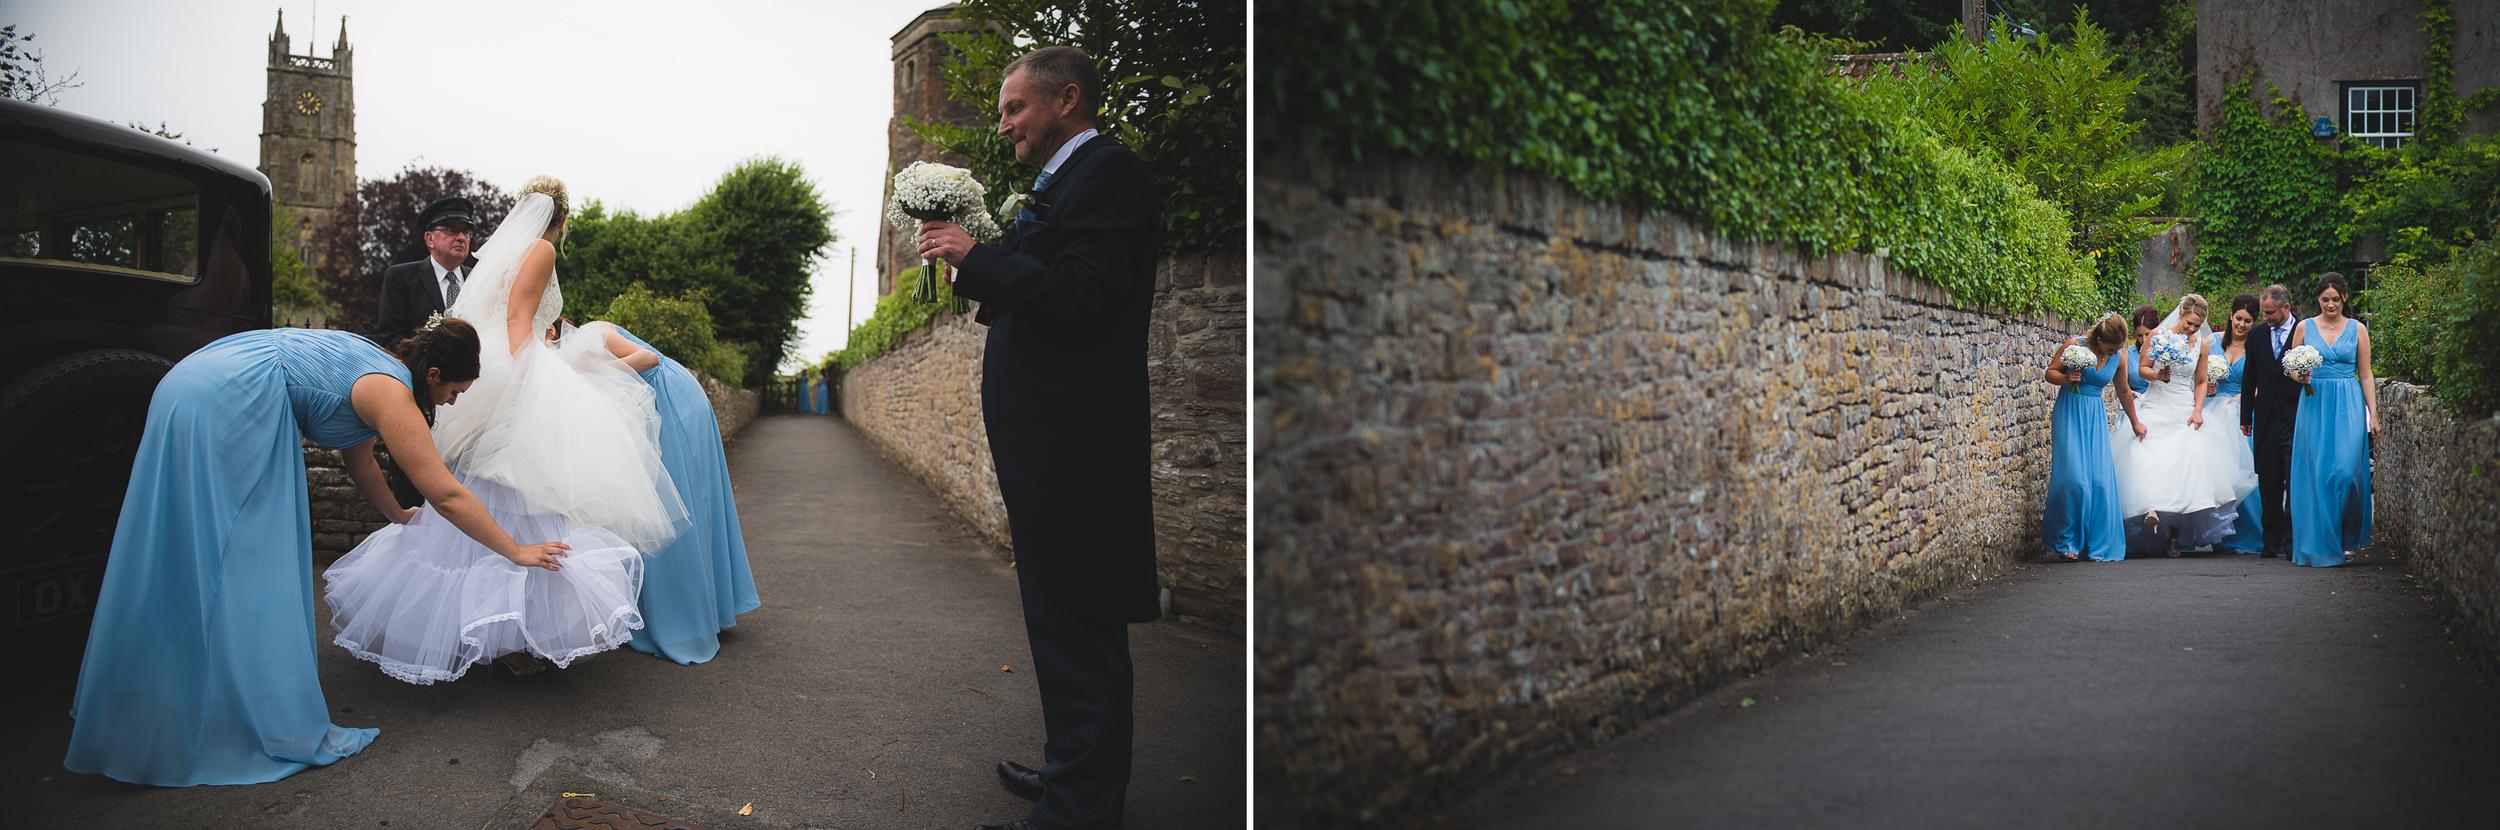 st peter's church portishead wedding